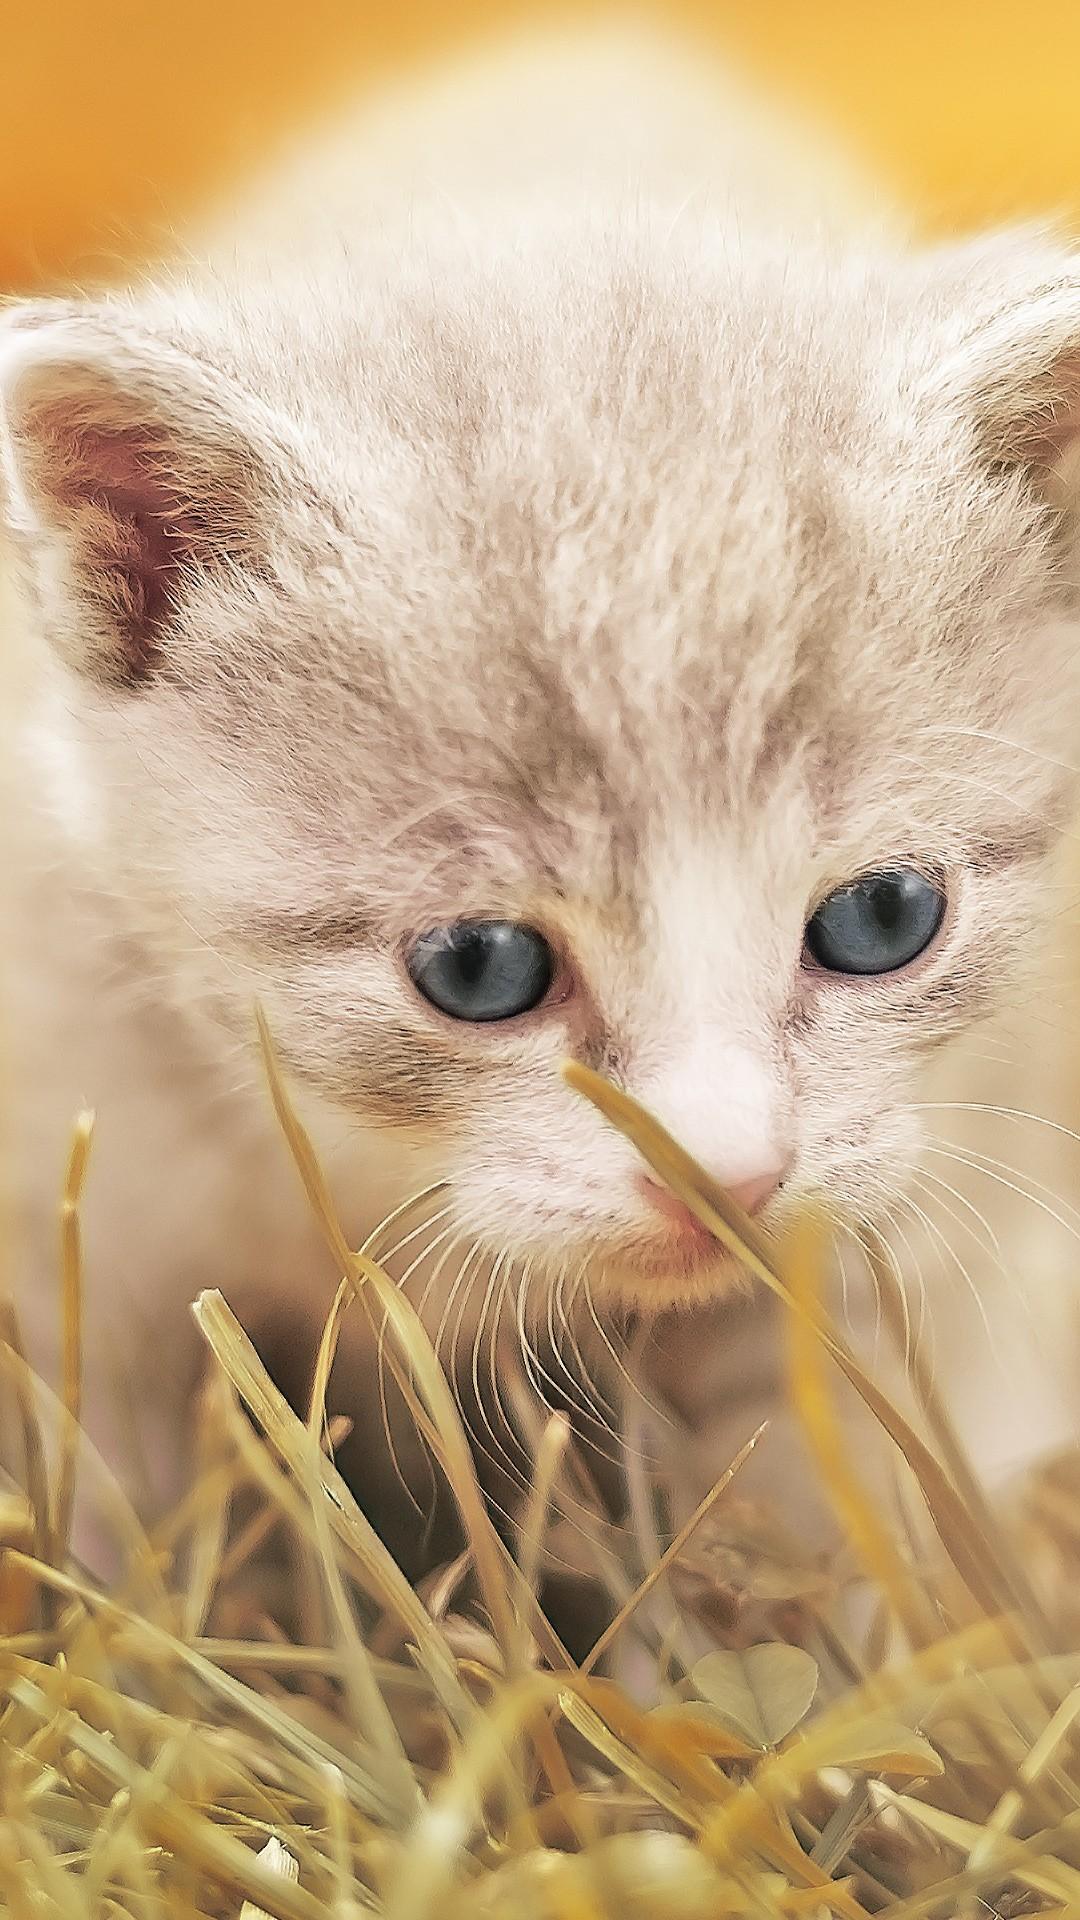 Cute Kittens Wallpaper For Iphone Cute Kitty Hd Wallpapers Hd Wallpapers Id 21257